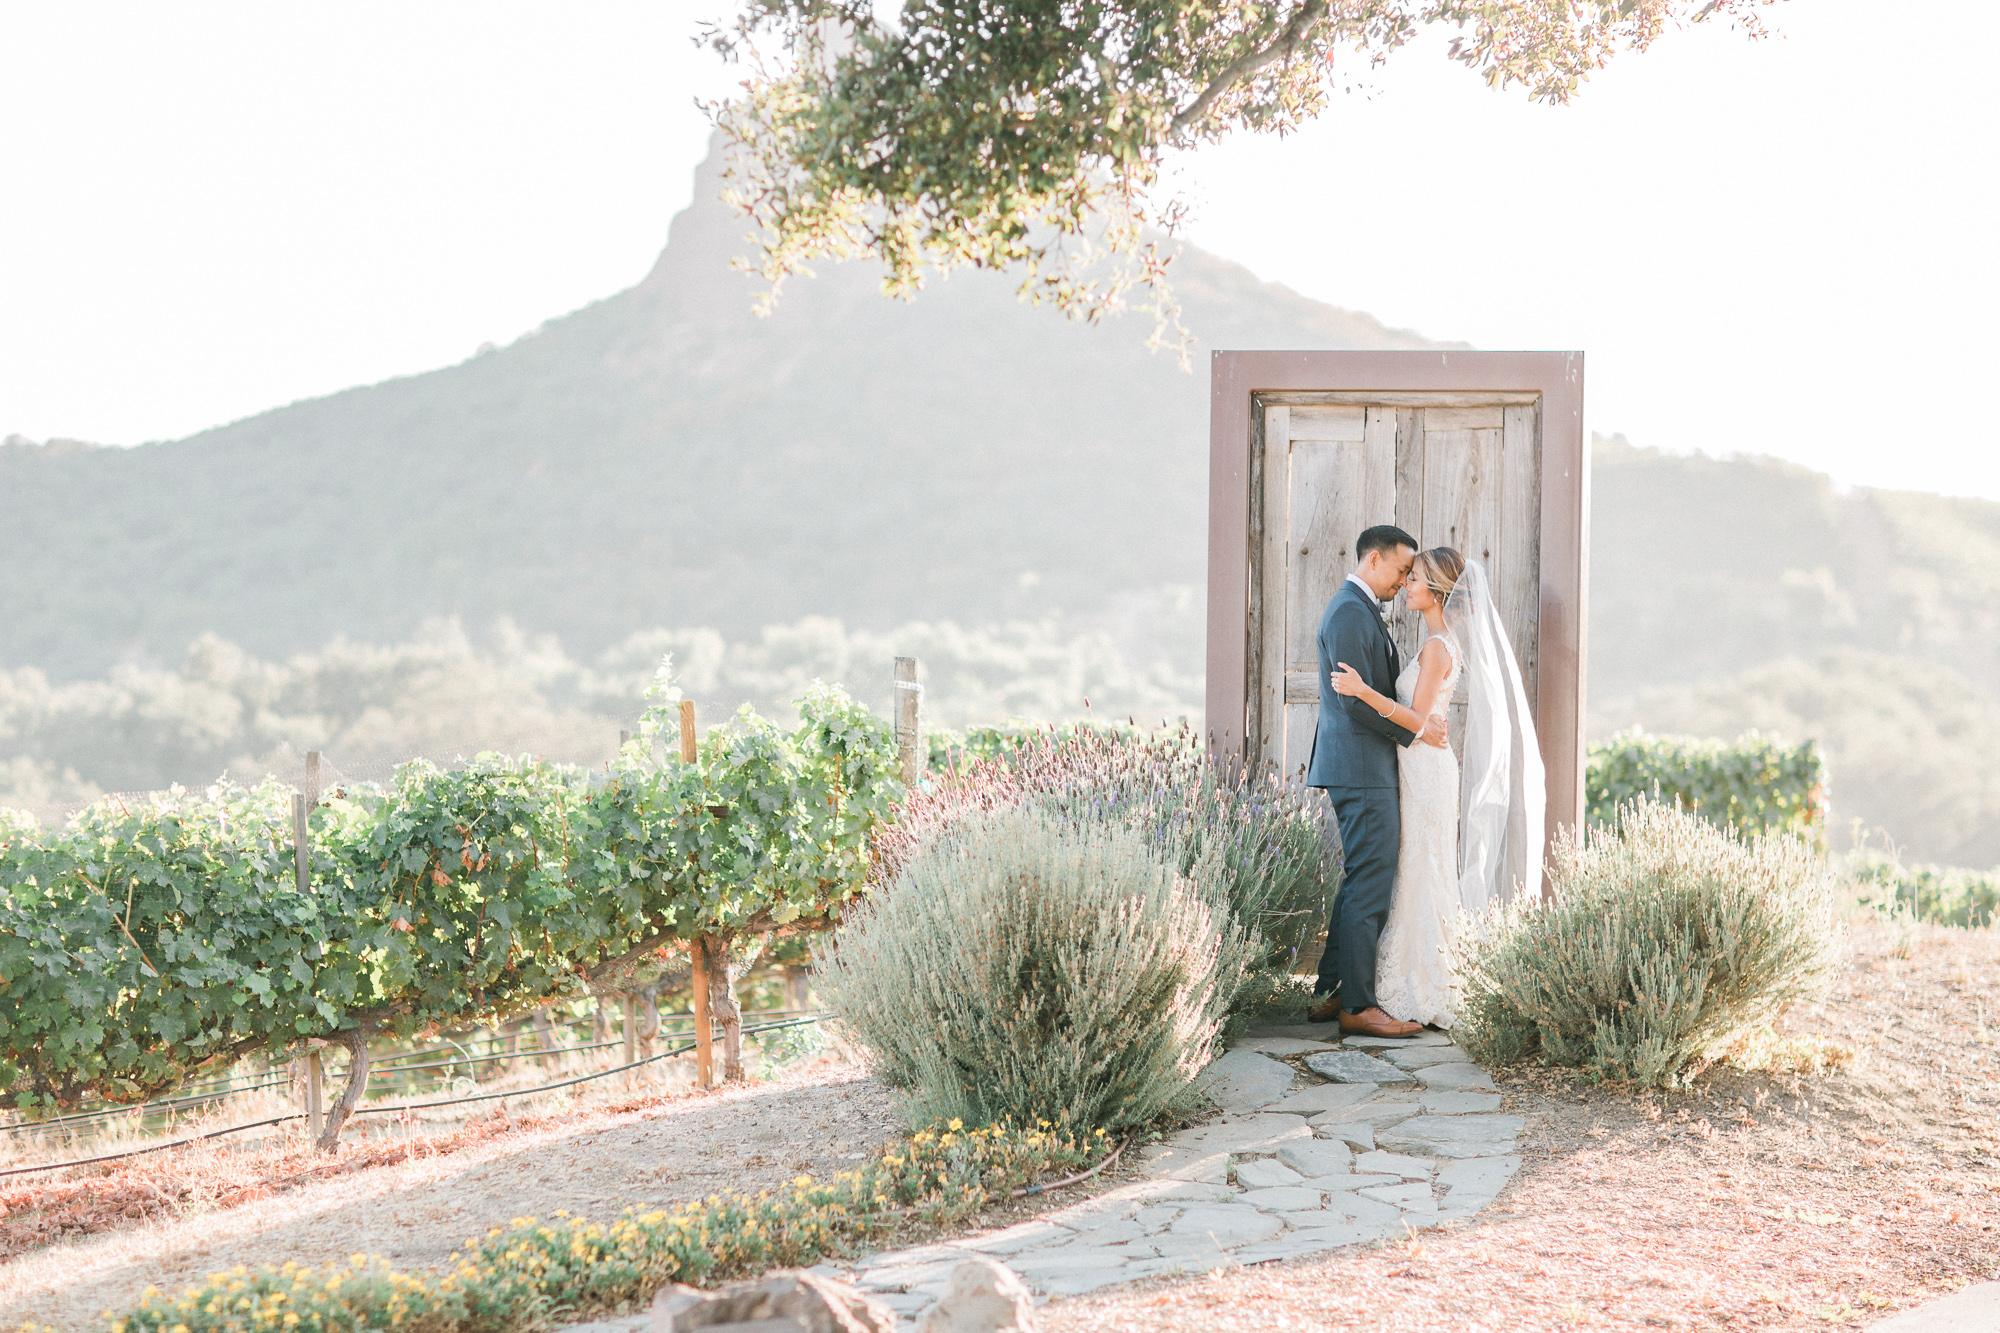 Saddlerock Ranch Wedding.Saddlerock Ranch Wedding Los Angeles Wedding Photographer Fine